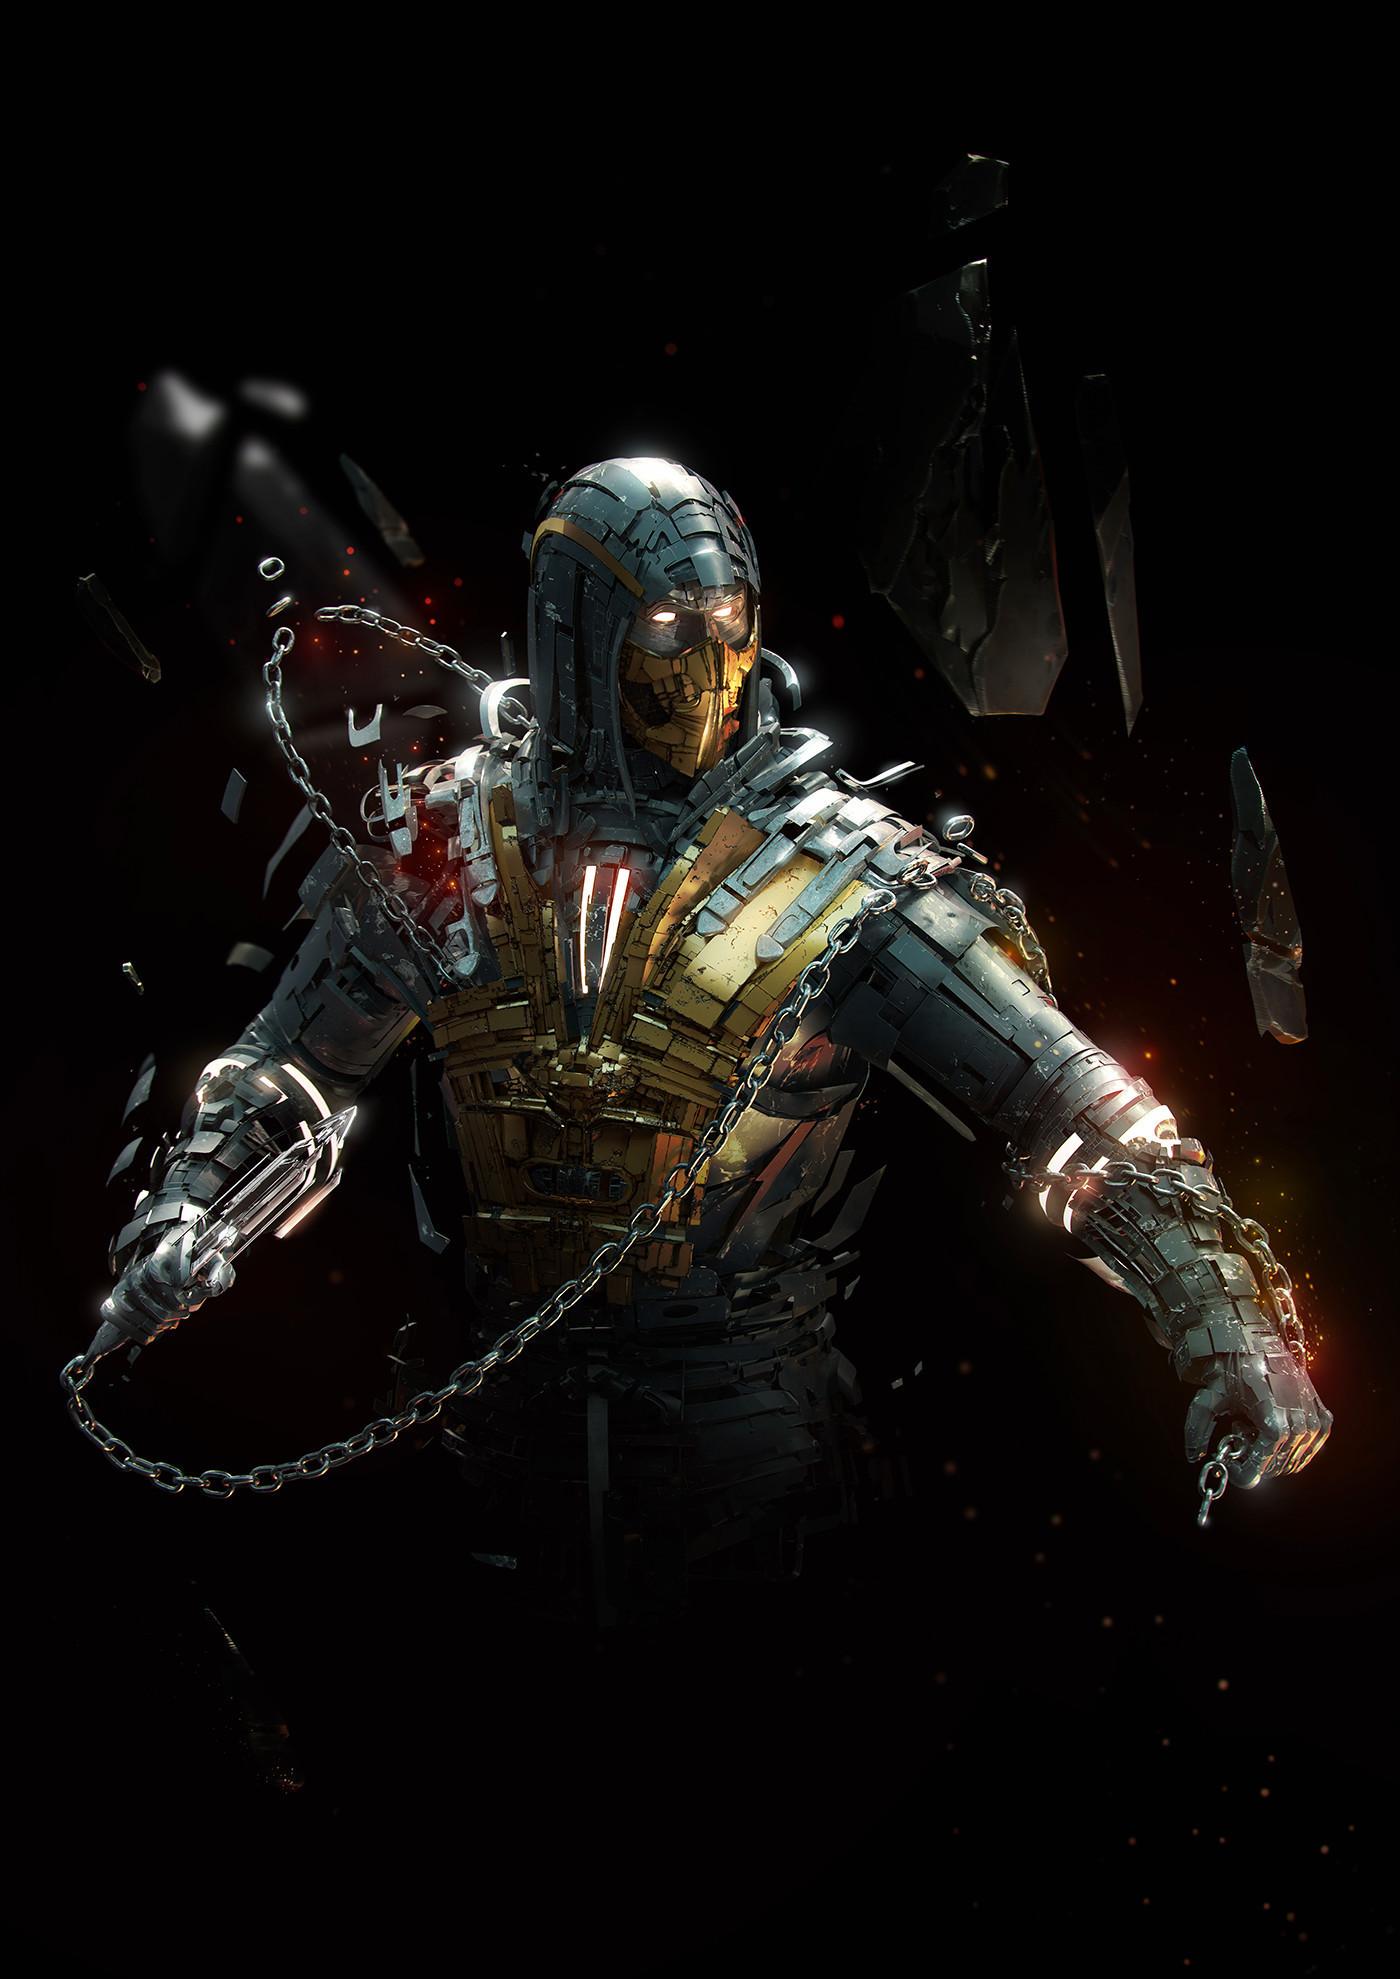 Mortal Kombat X Scorpion Wallpaper (74+ images)